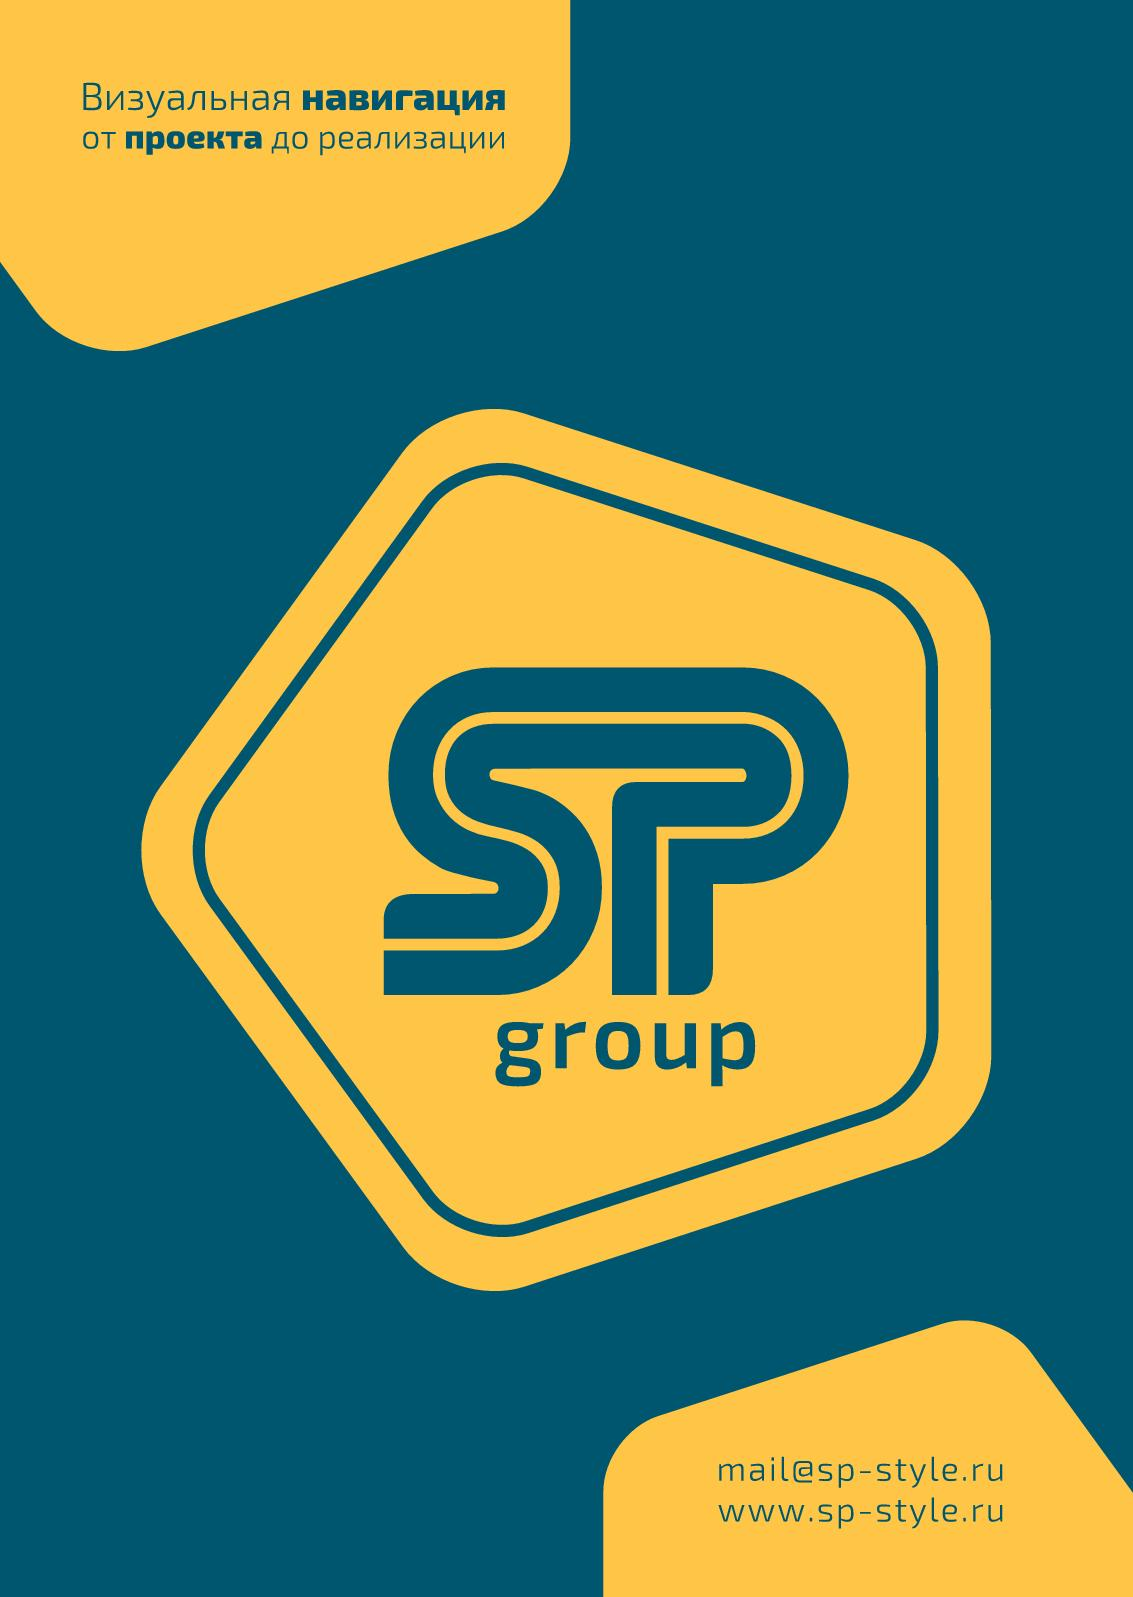 Презентация Группы компаний SP Group